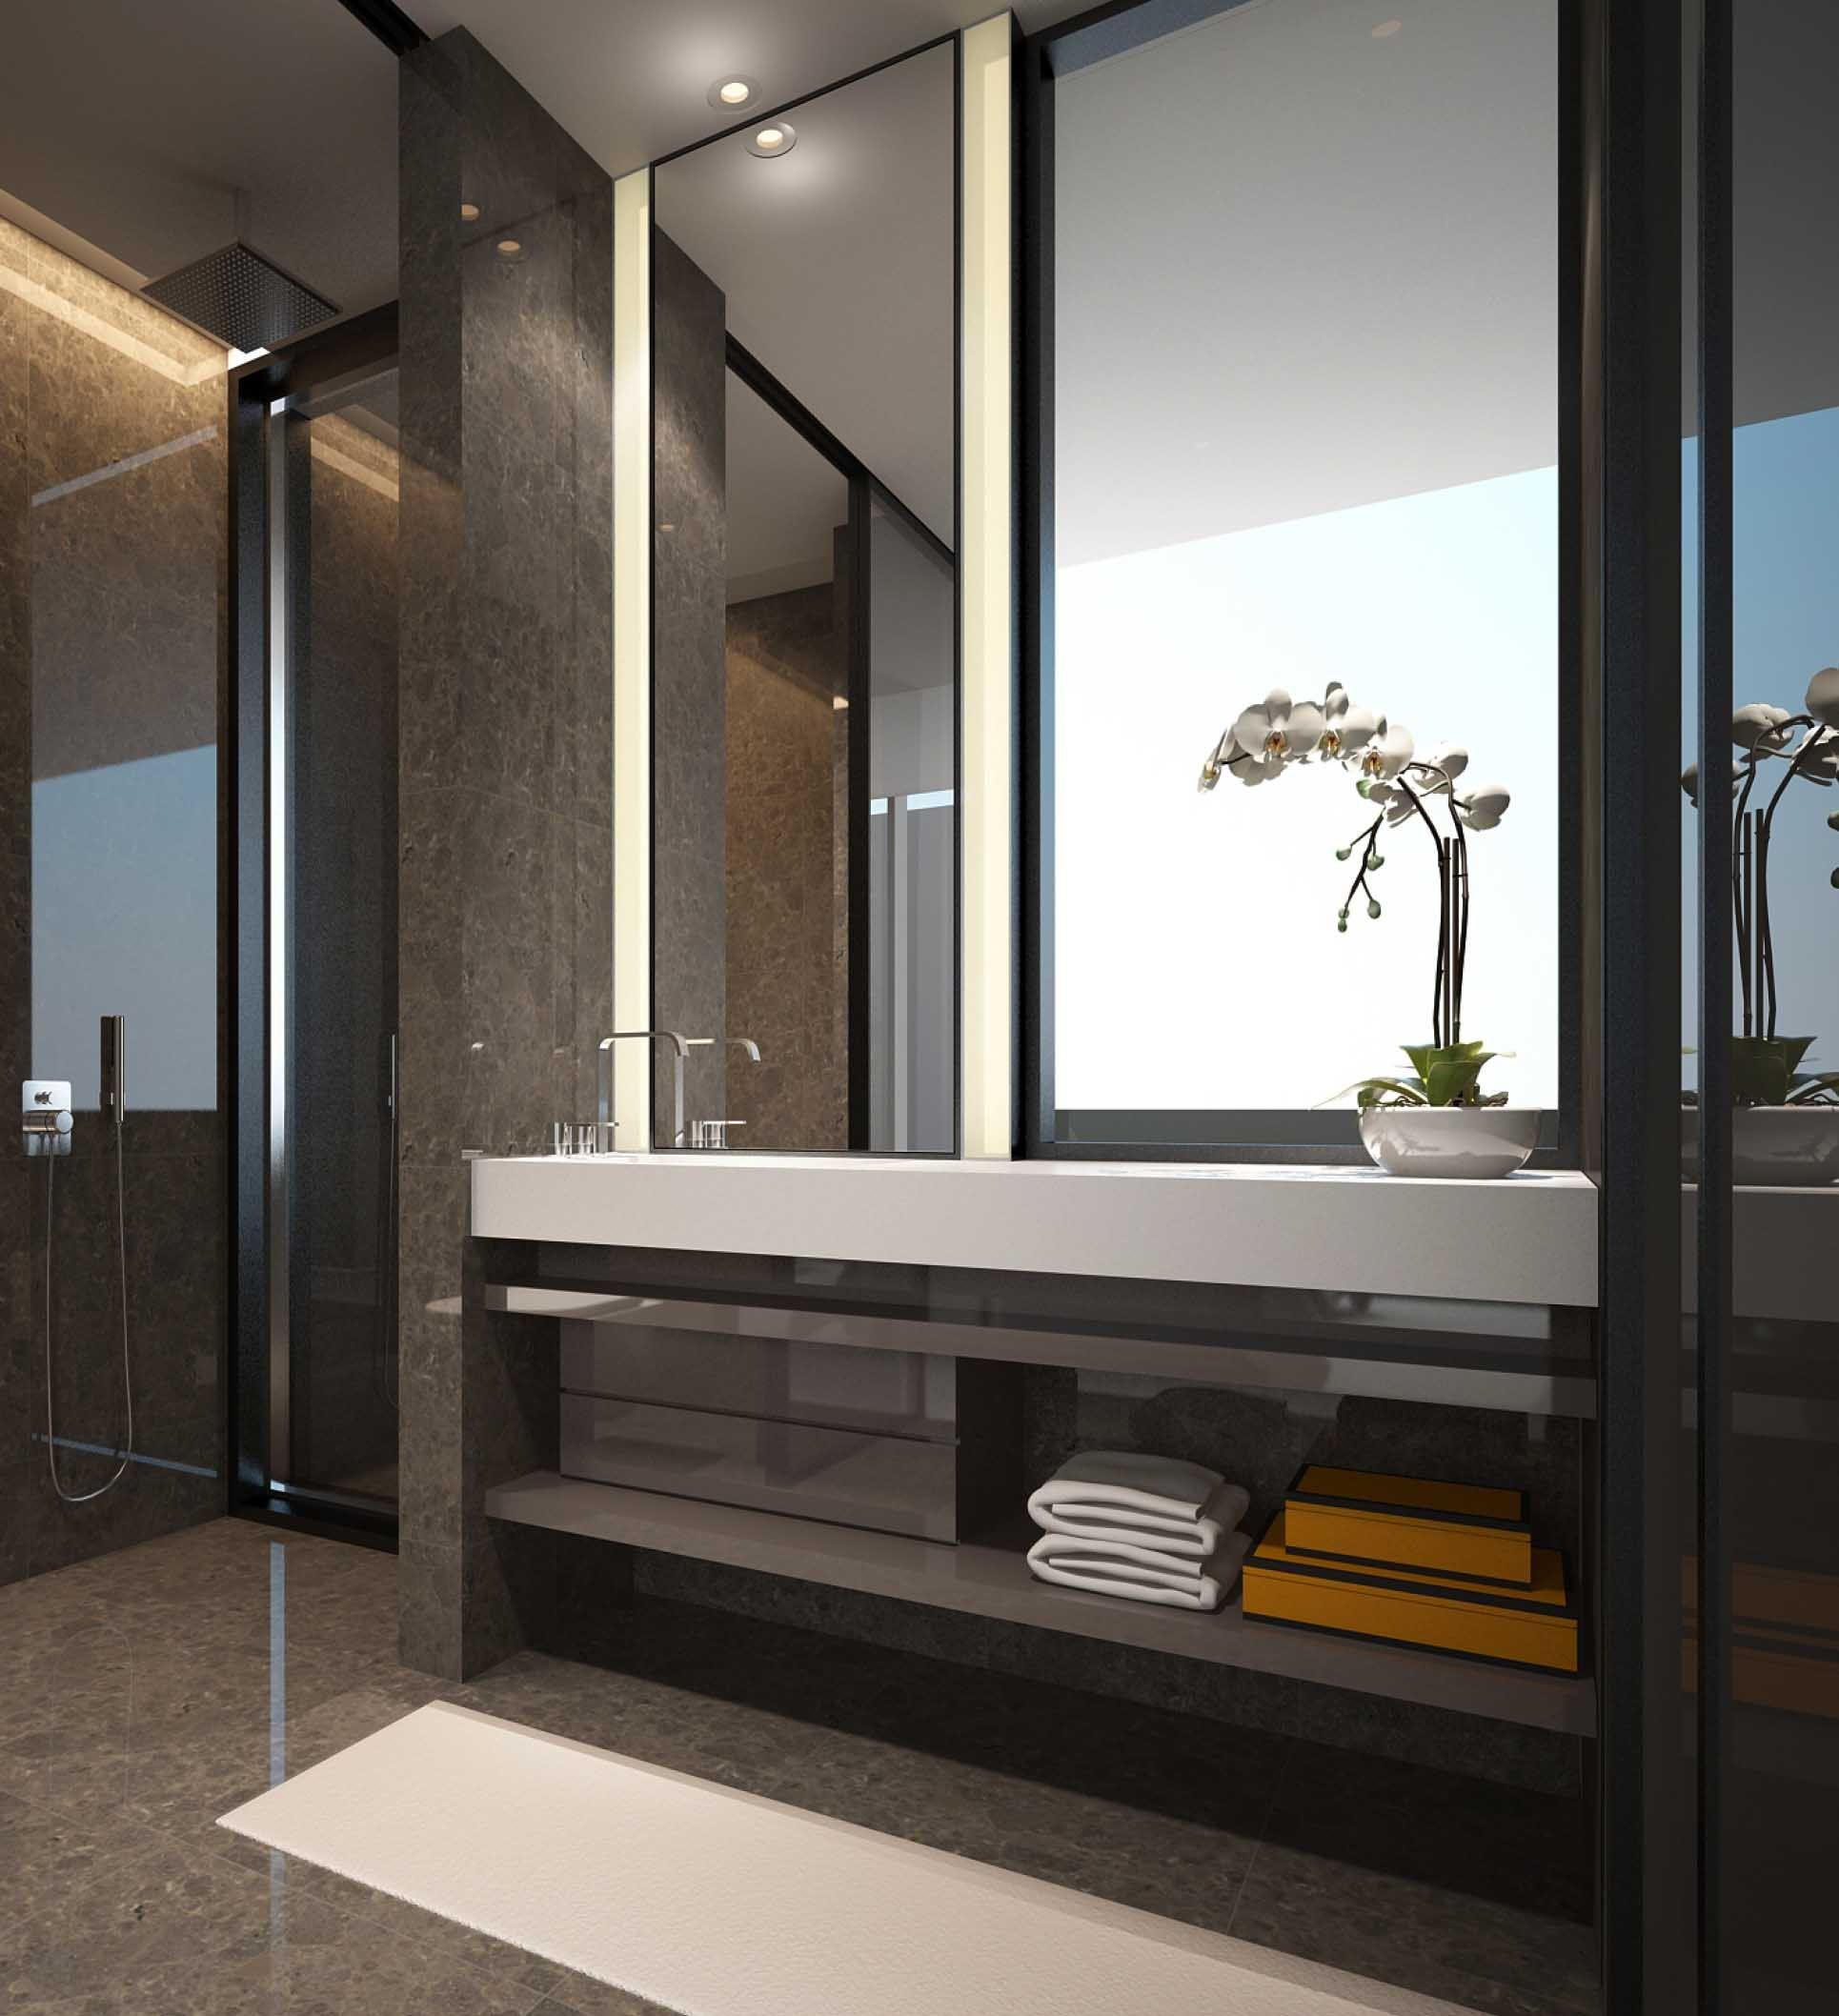 Explore Grey Bathrooms Decor And More SCDA GCMN Apartments Jakarta